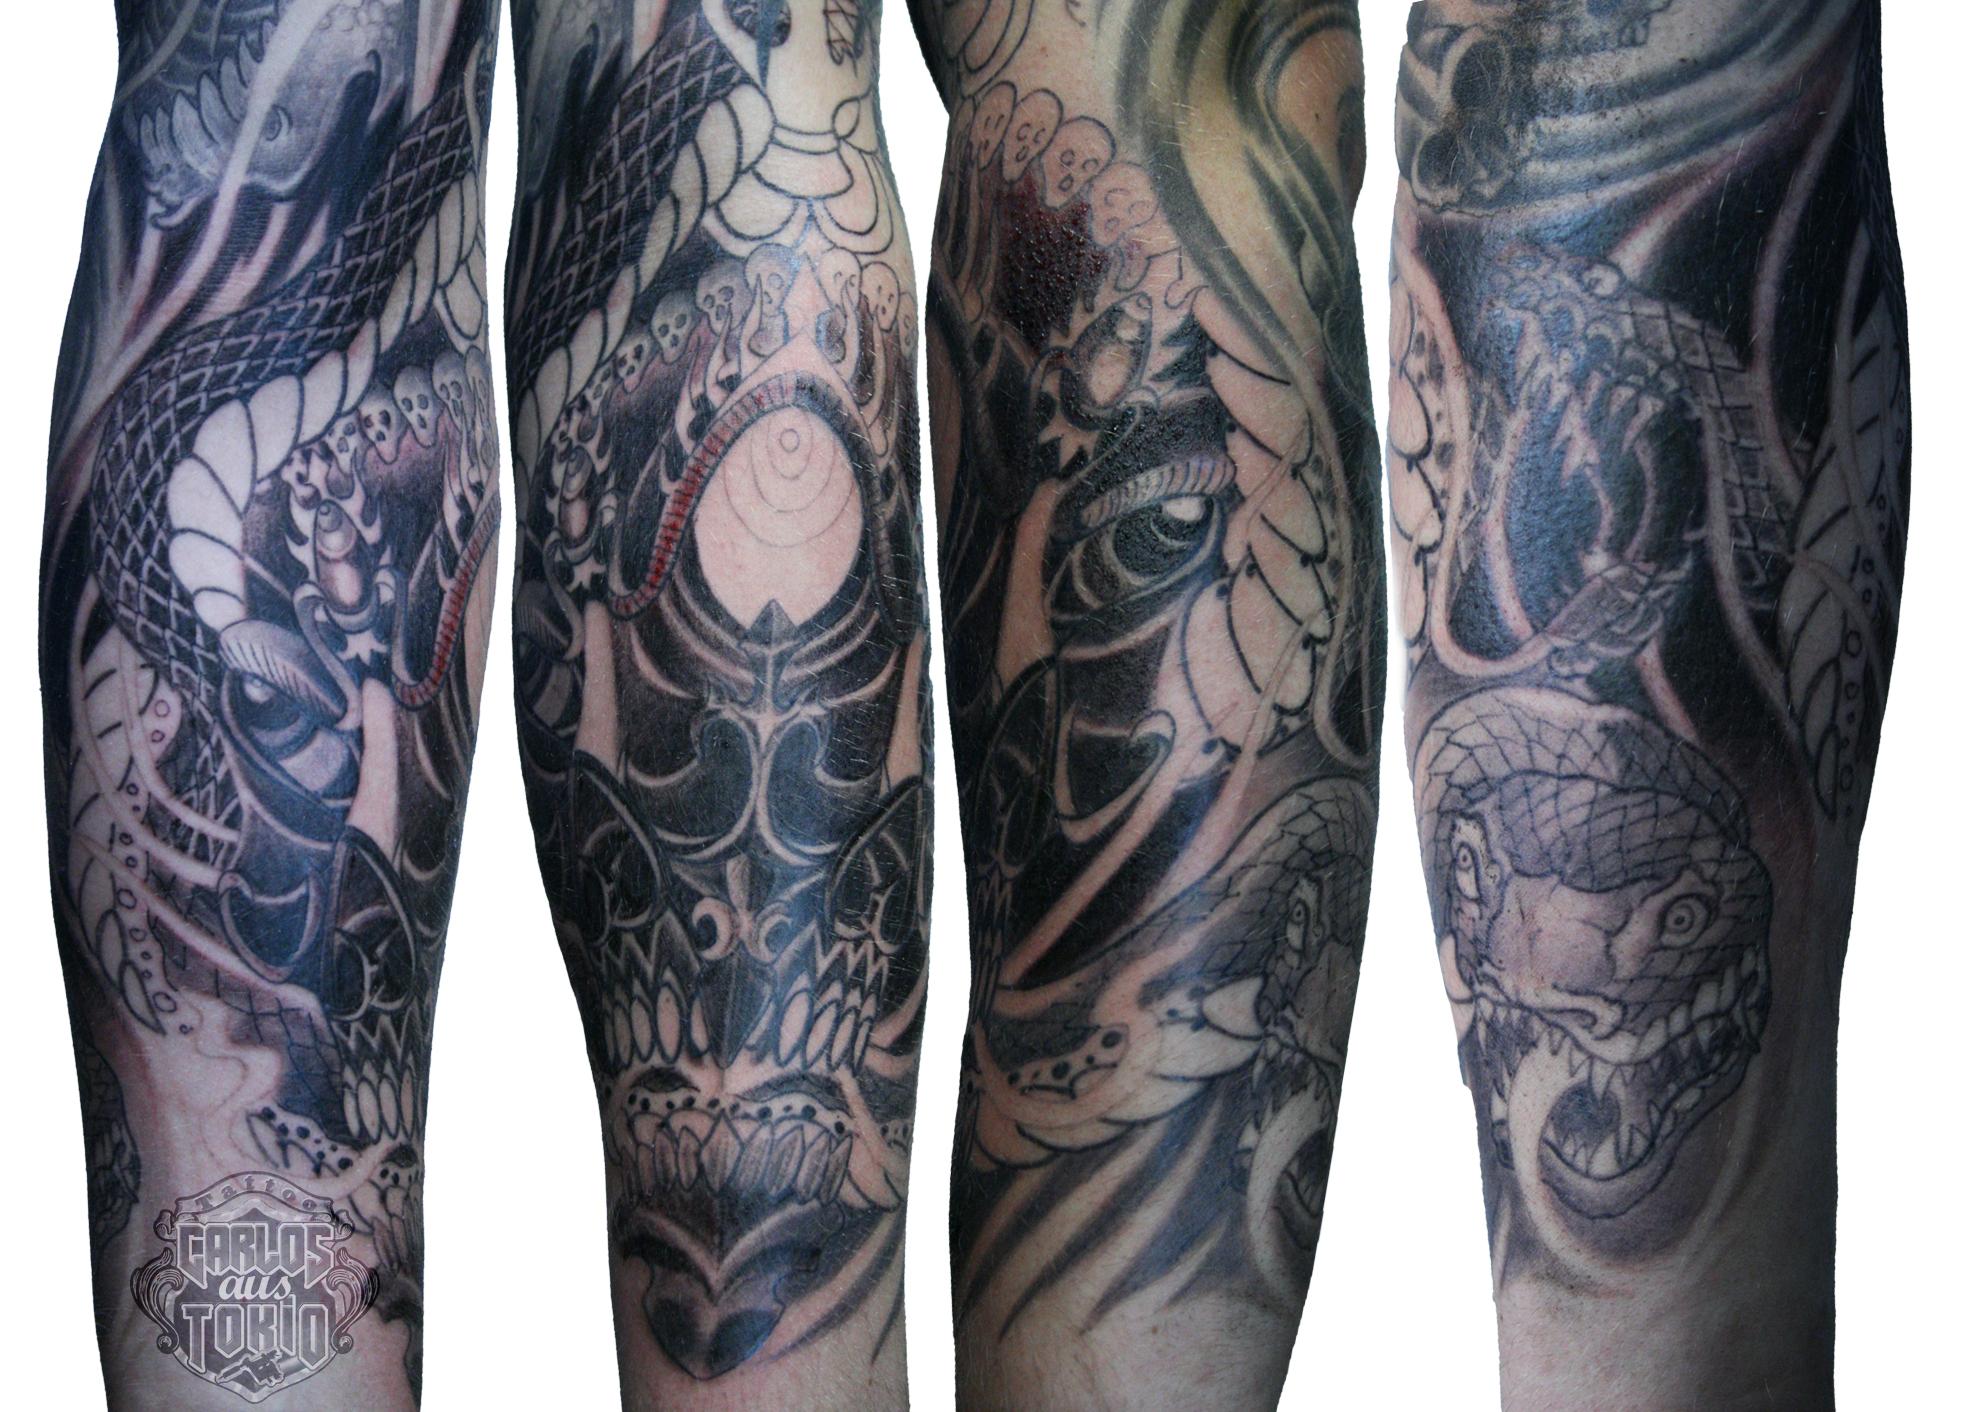 tibetisch totenkopf tattoo tibetan skull 3 carlos tattoo. Black Bedroom Furniture Sets. Home Design Ideas